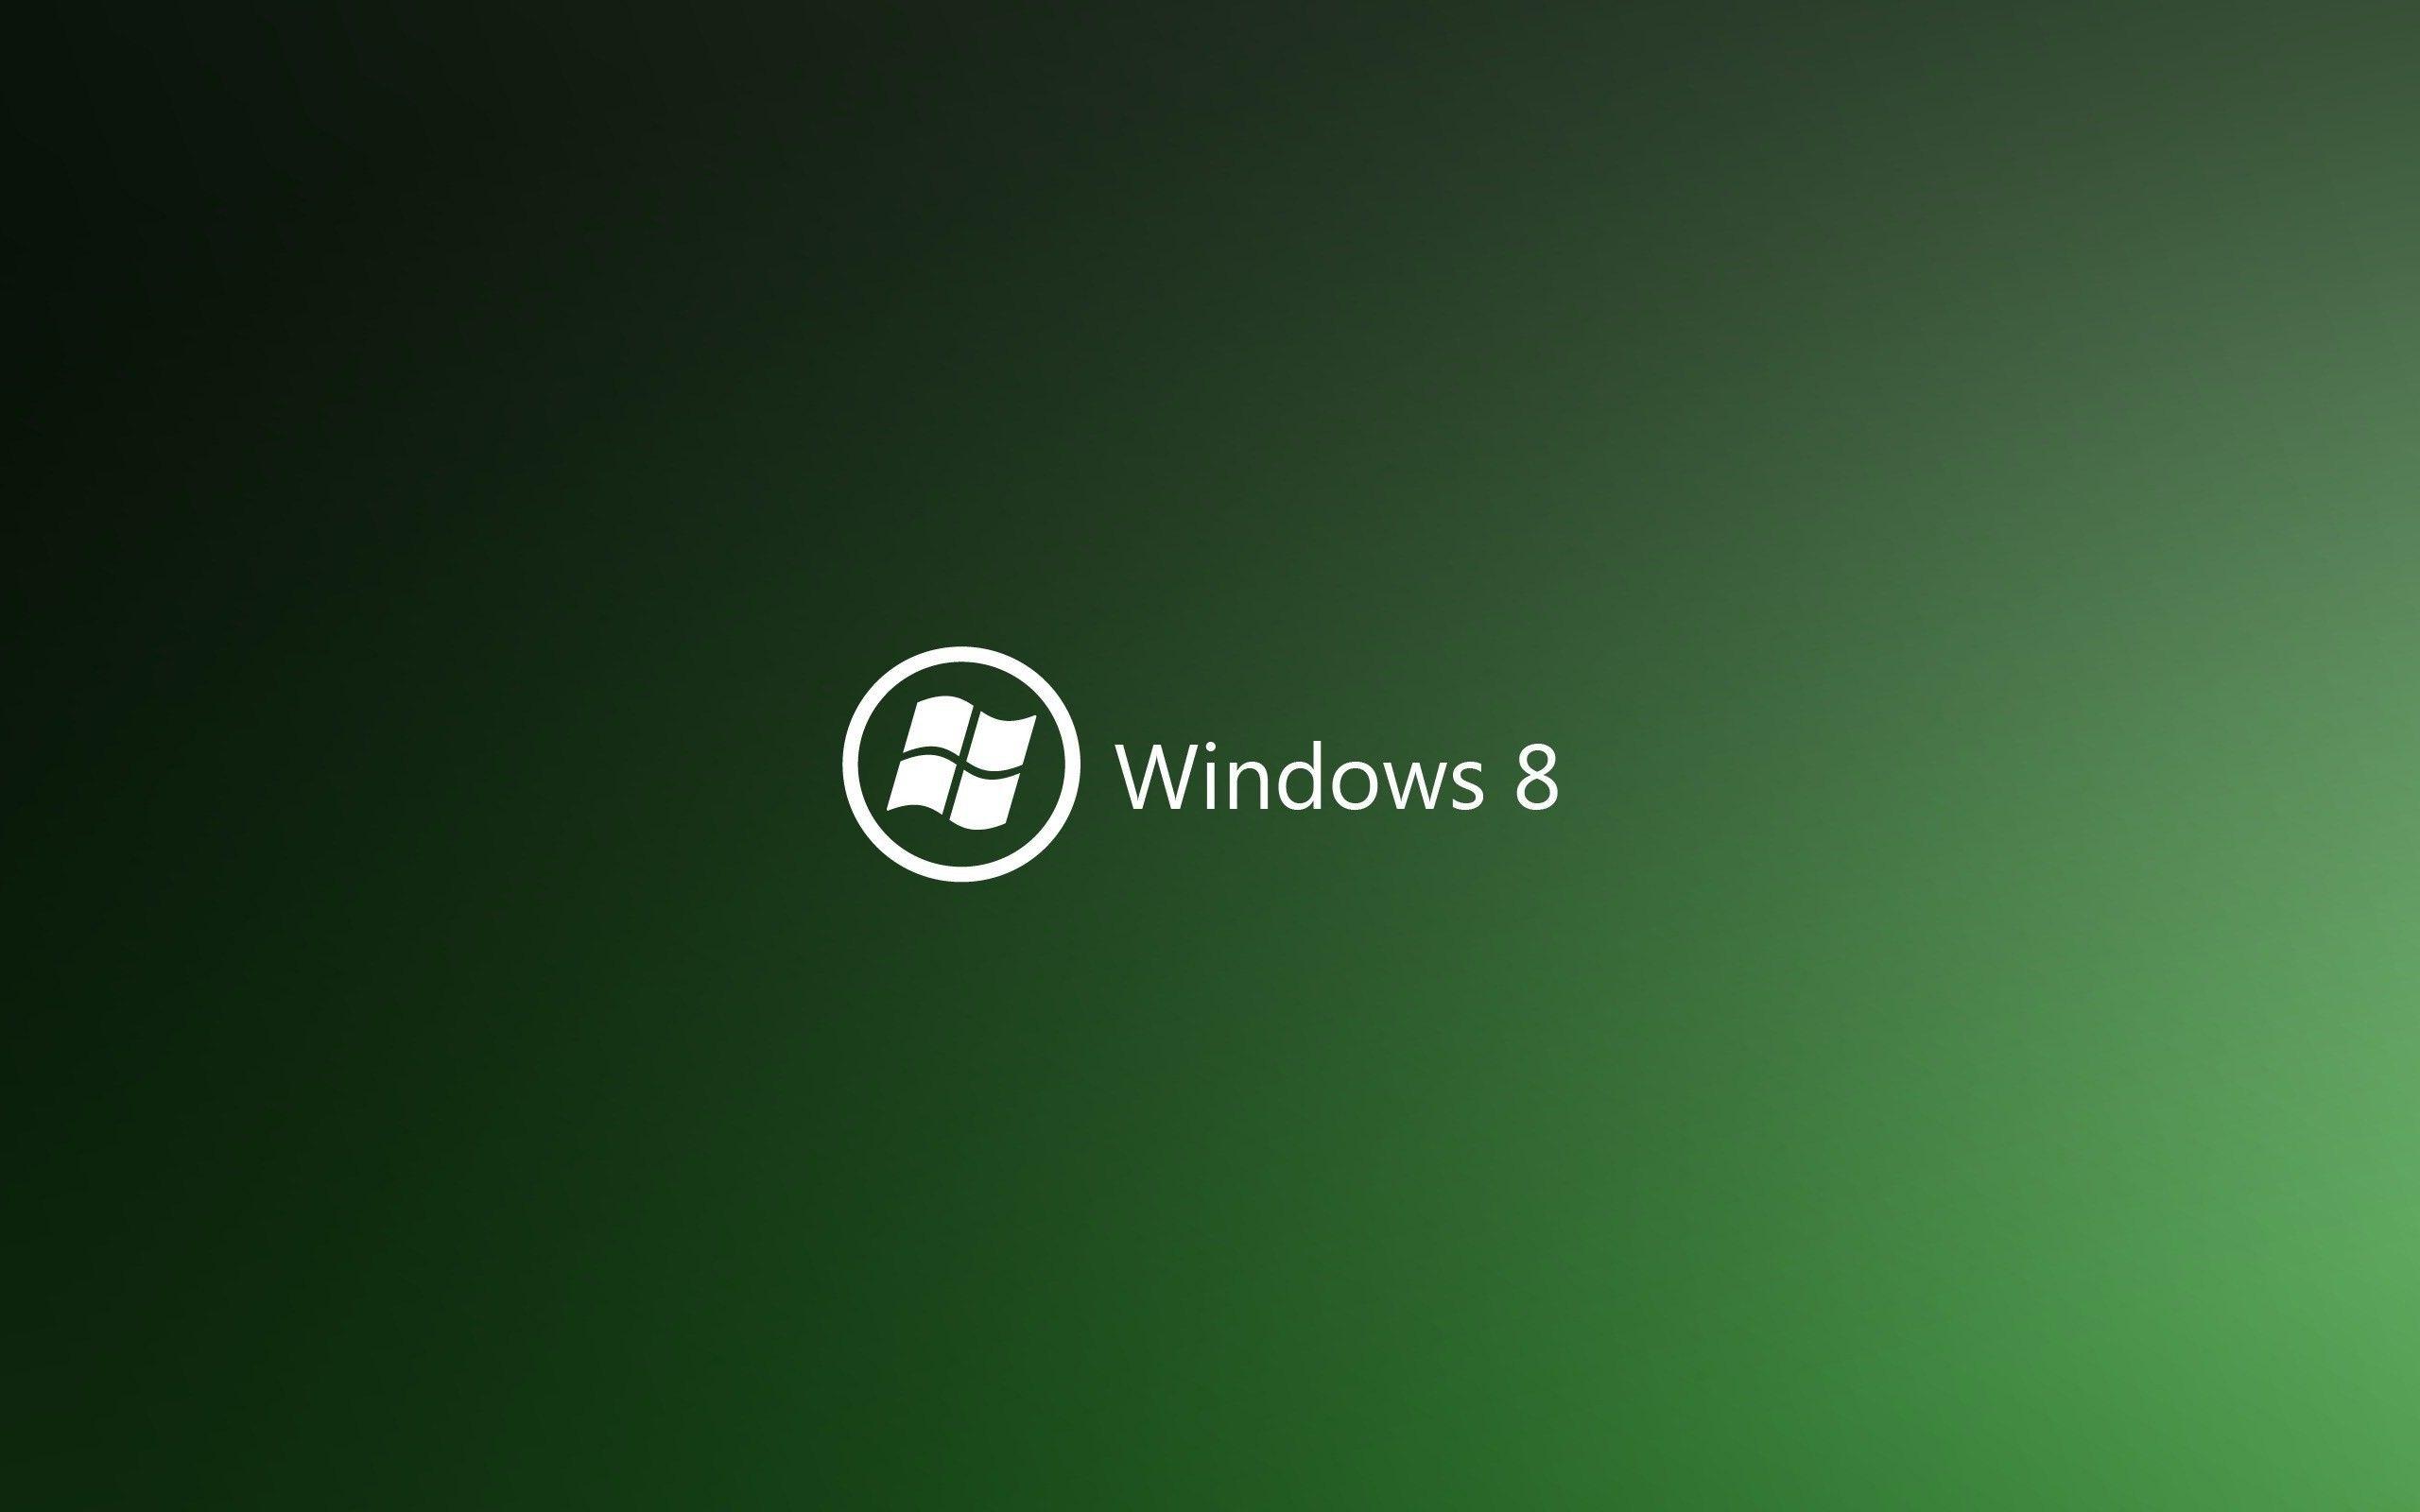 windows-8-green-logo-hd-wallpaper   windows hd wallpapers